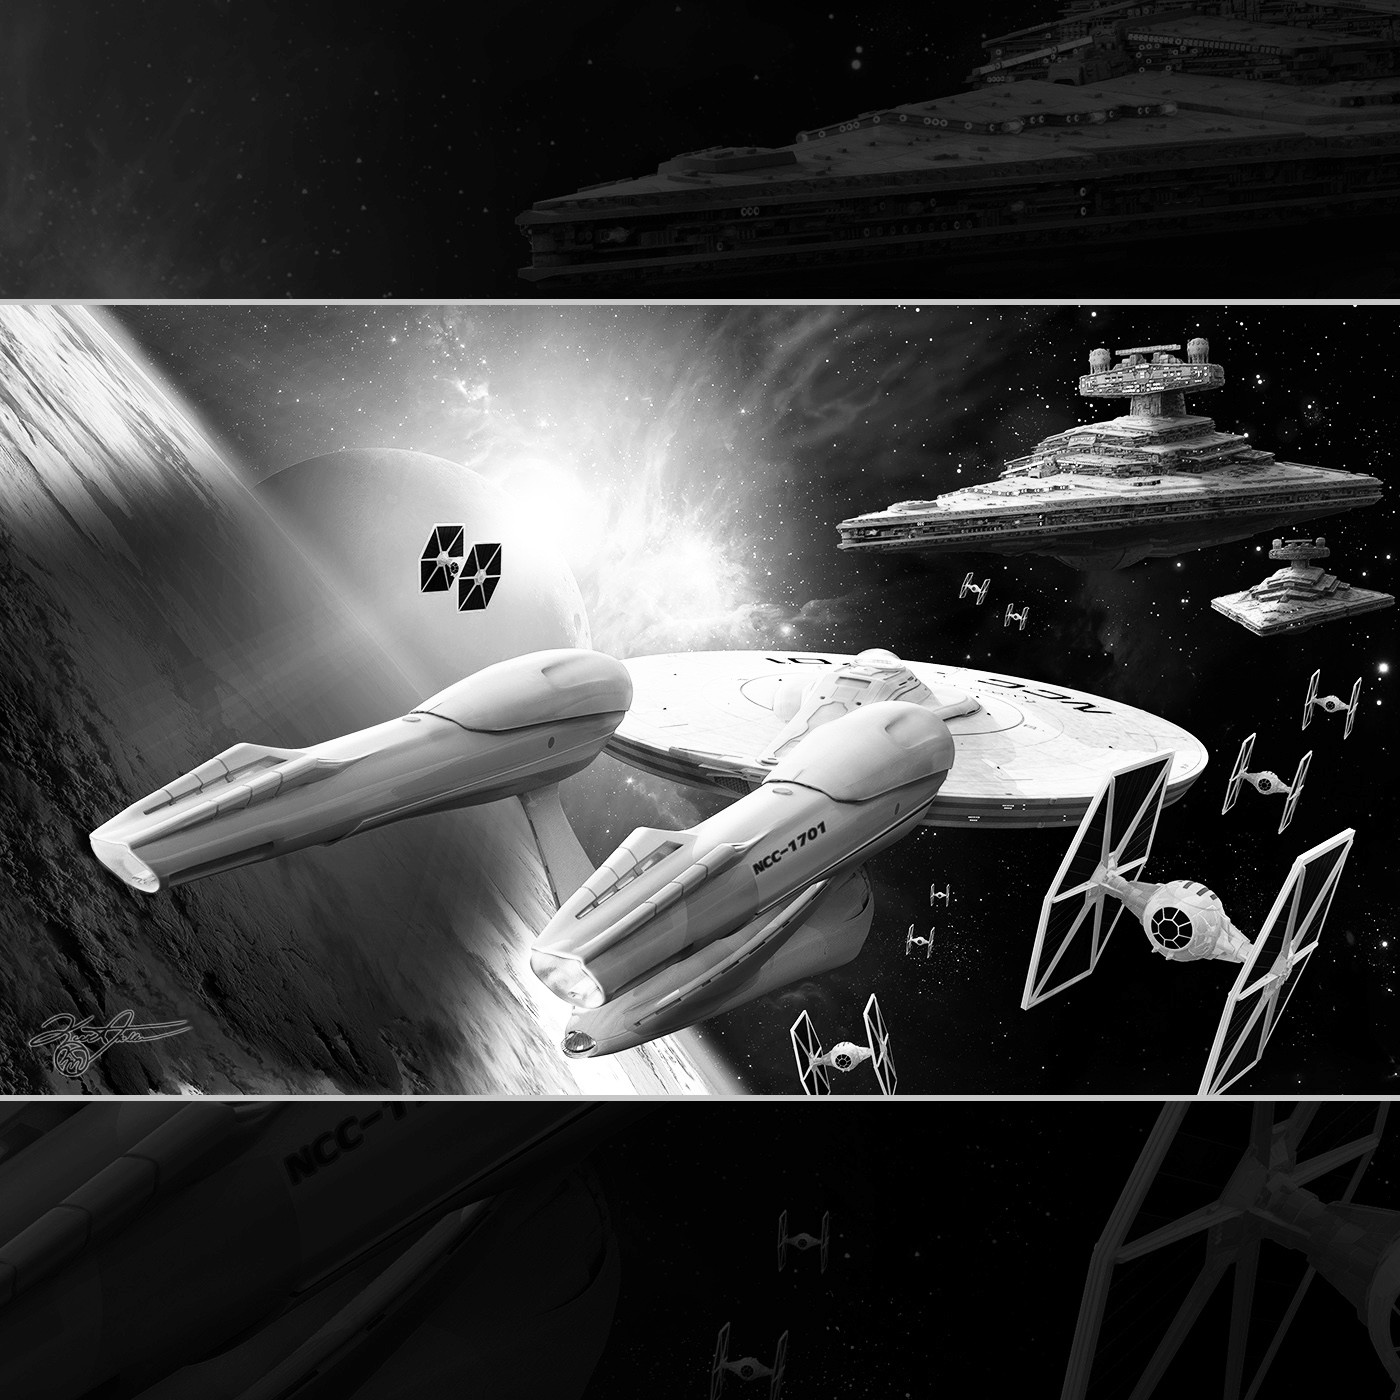 U.S.S. Enterprise meets Star Destroyer